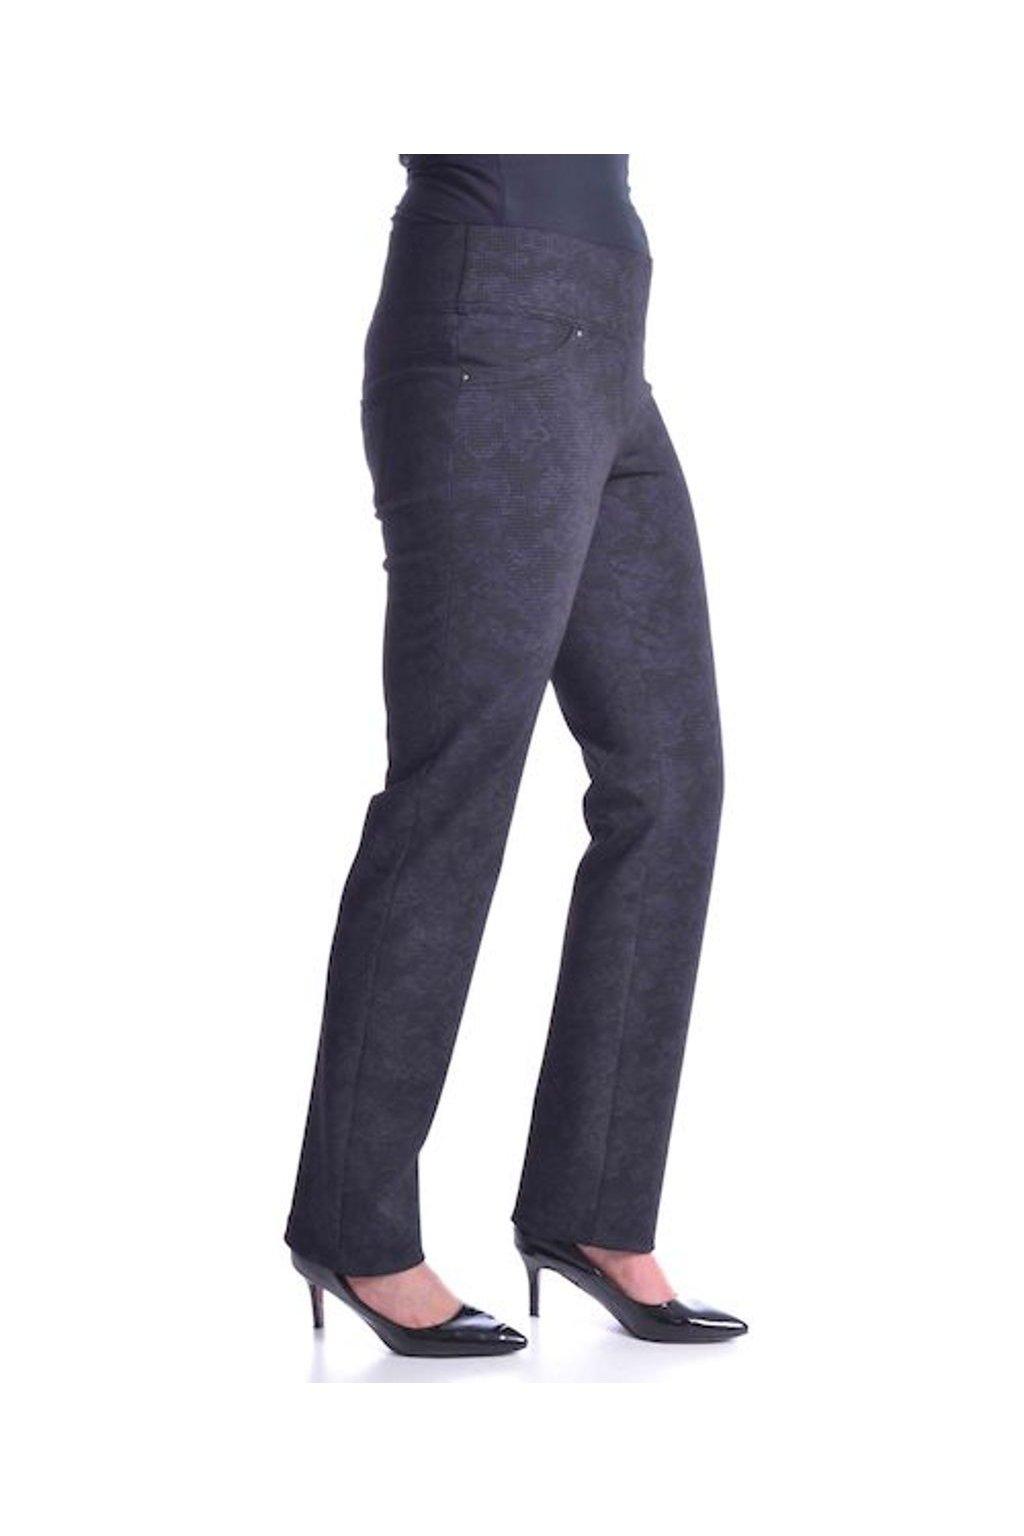 Kalhoty deluxe vysoký pas 50T (Velikost 36, Barva Vzorovaná)